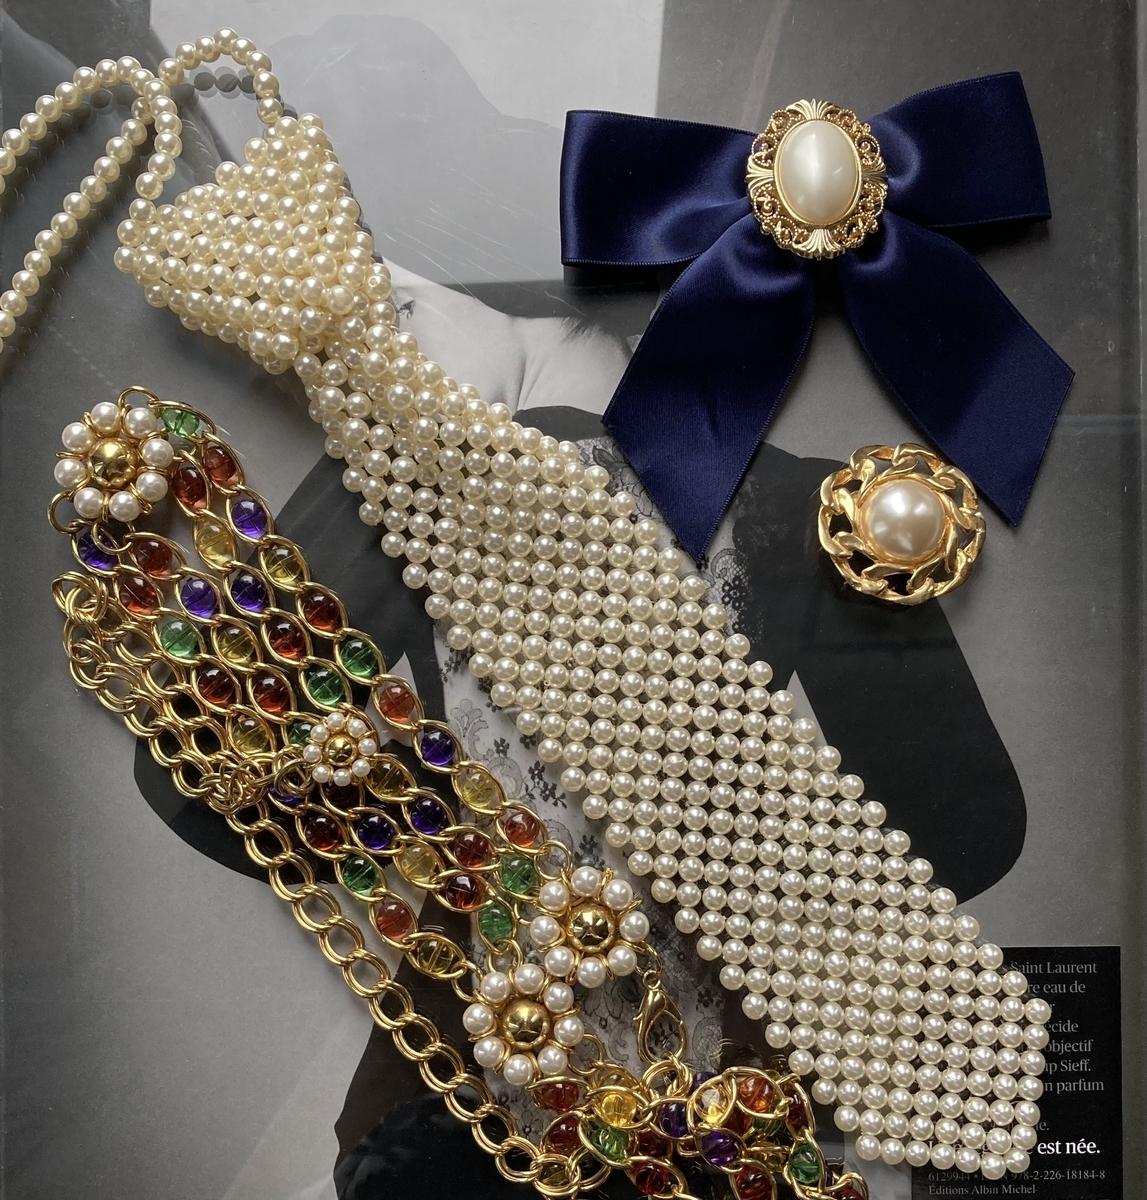 f:id:jewellerywanderlust:20210712143028j:plain